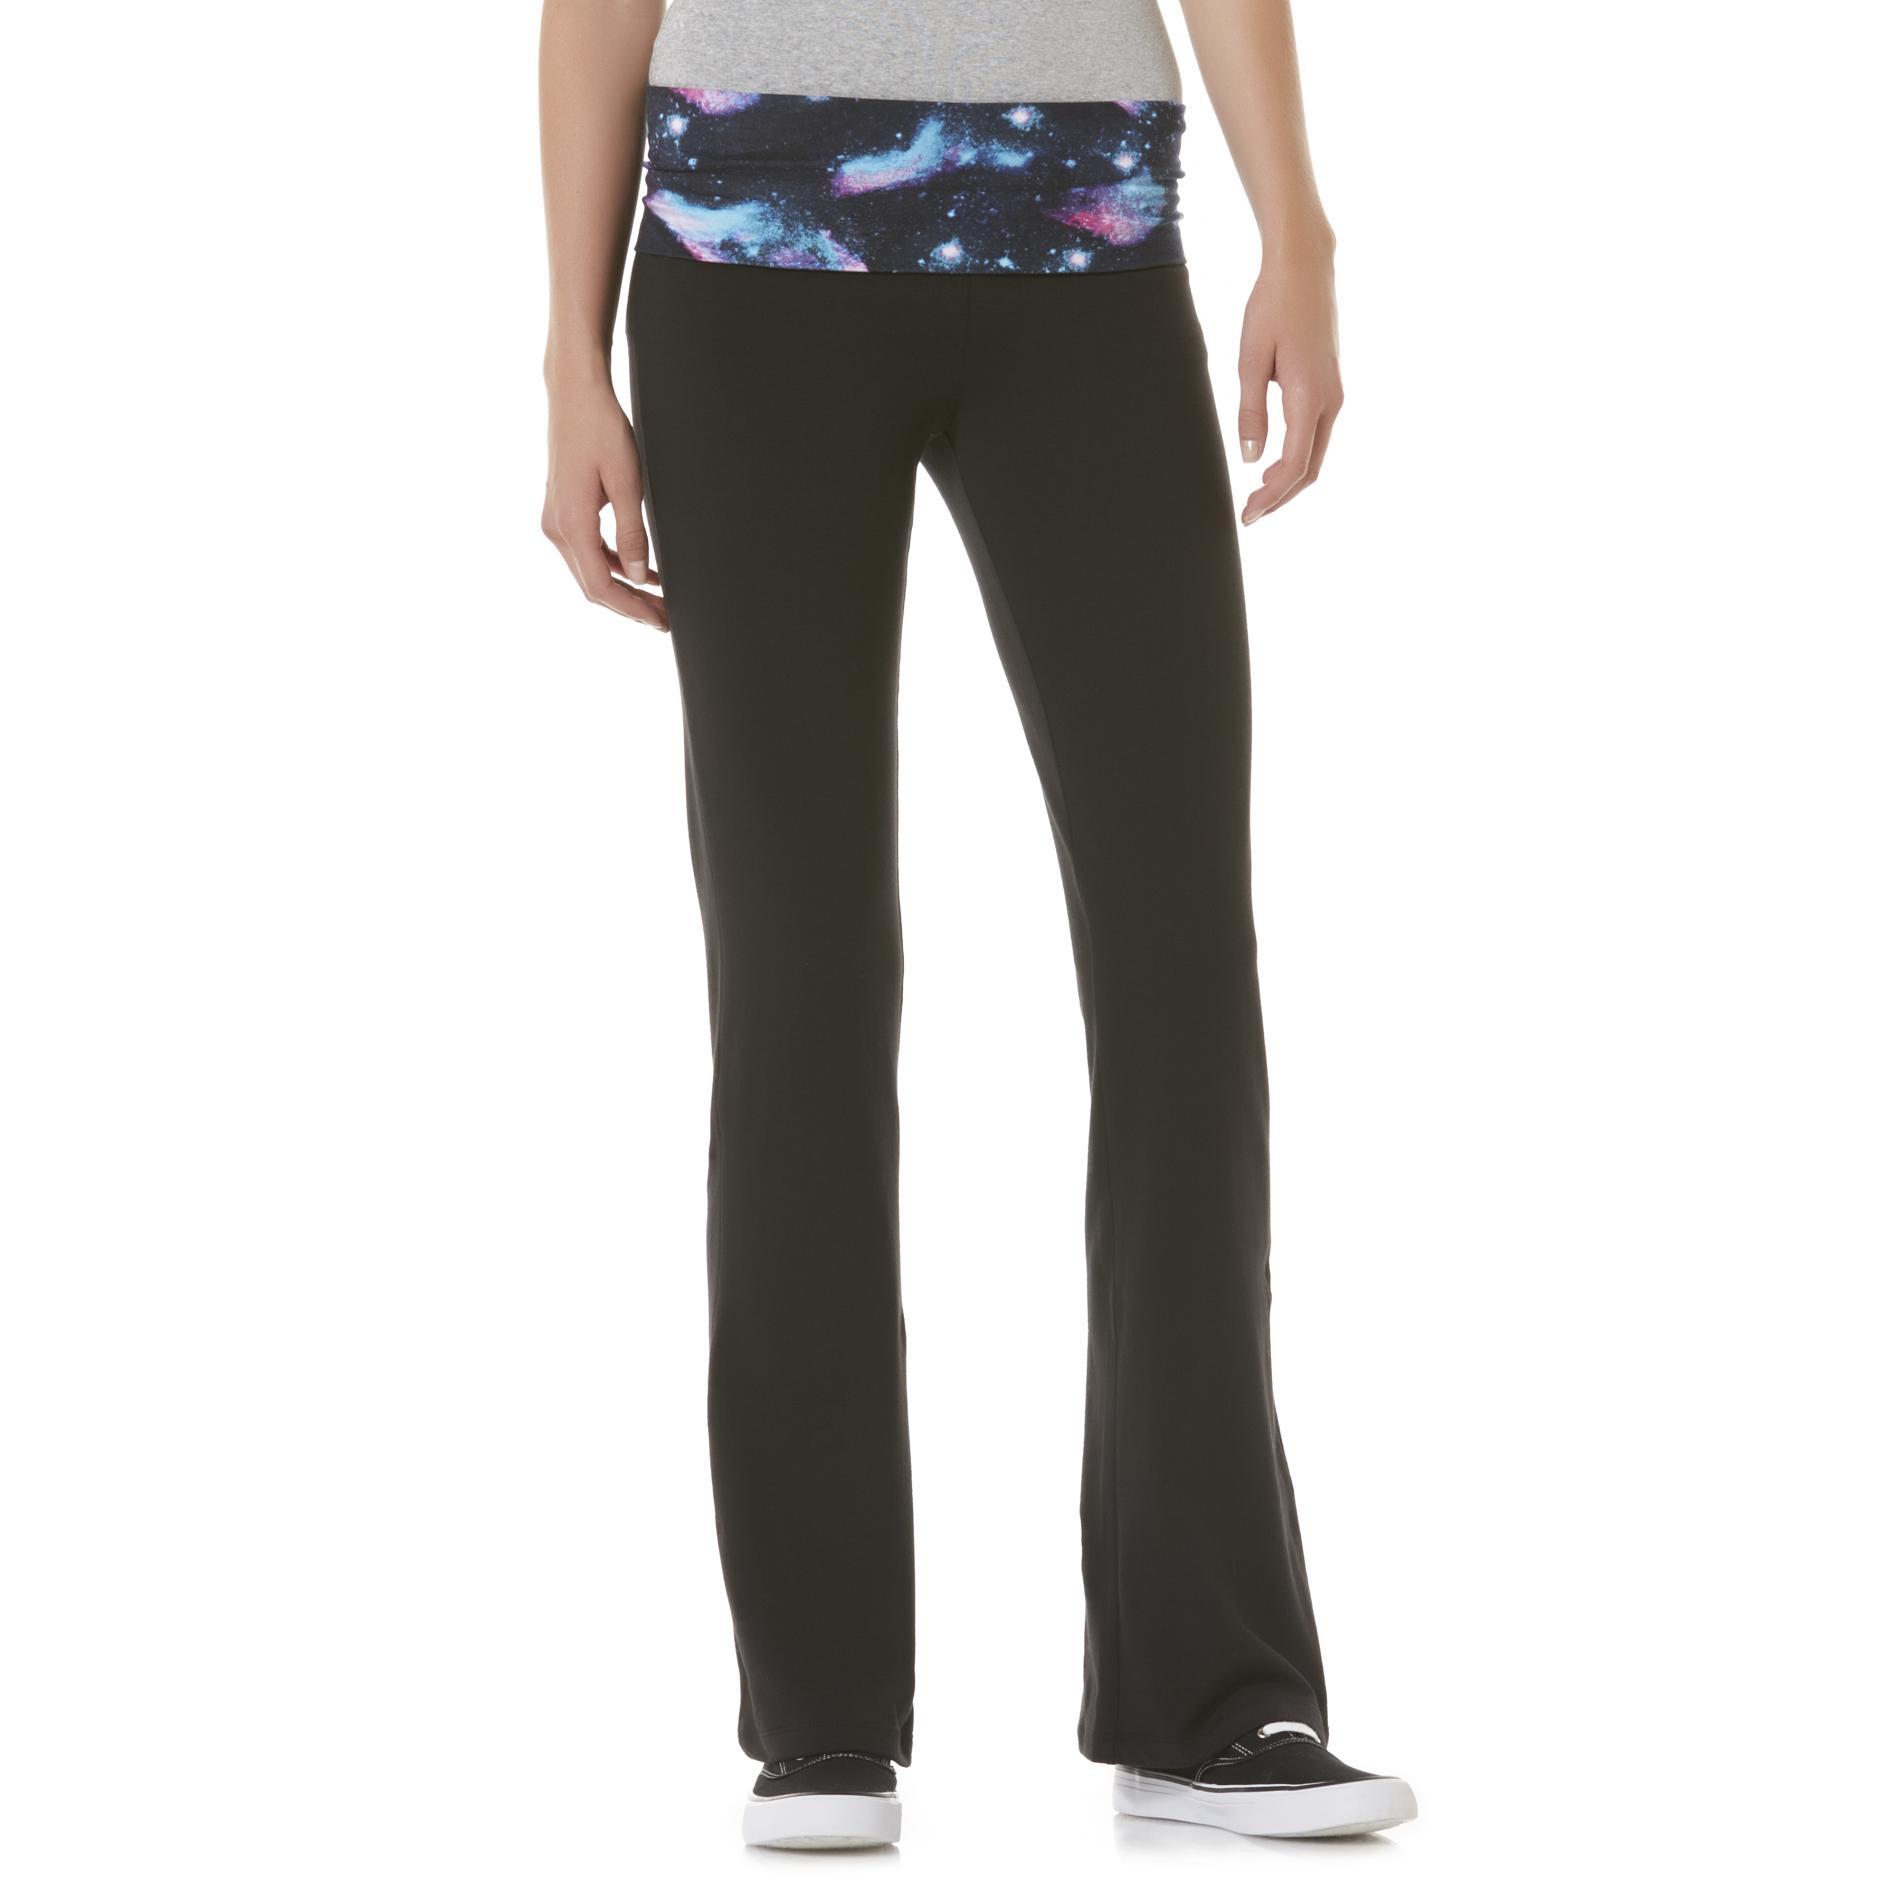 Junior's Fold-Over Bootcut Yoga Pants - Galaxy